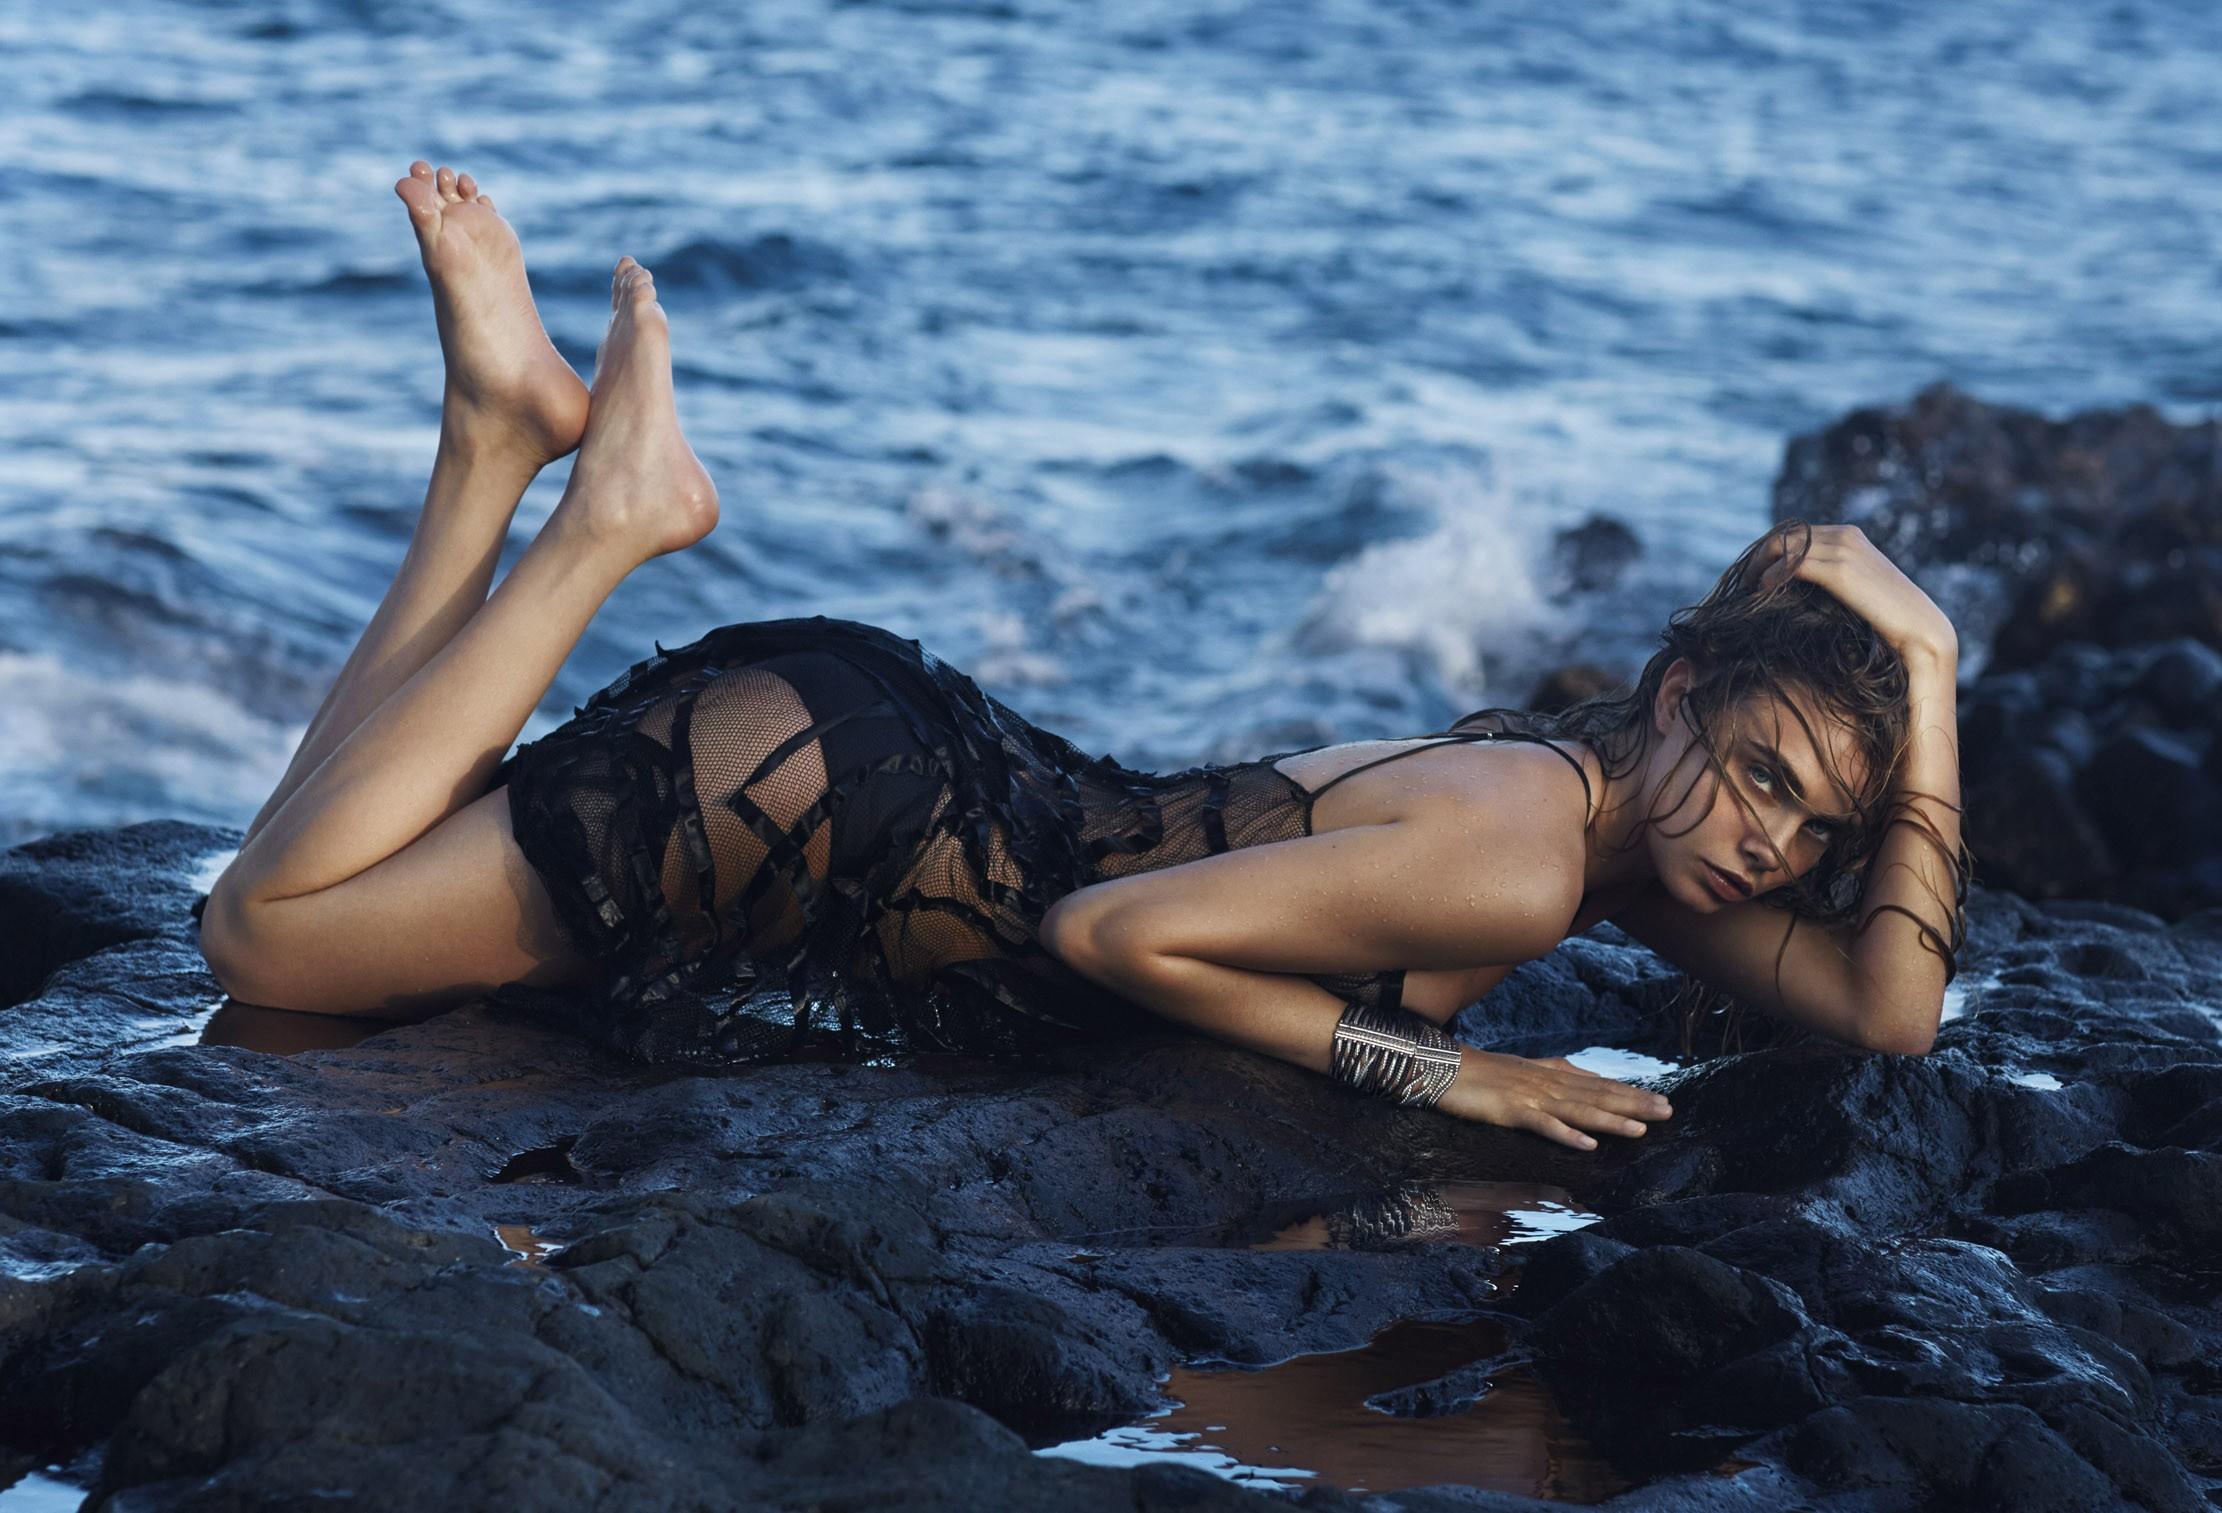 cara delevingne beach